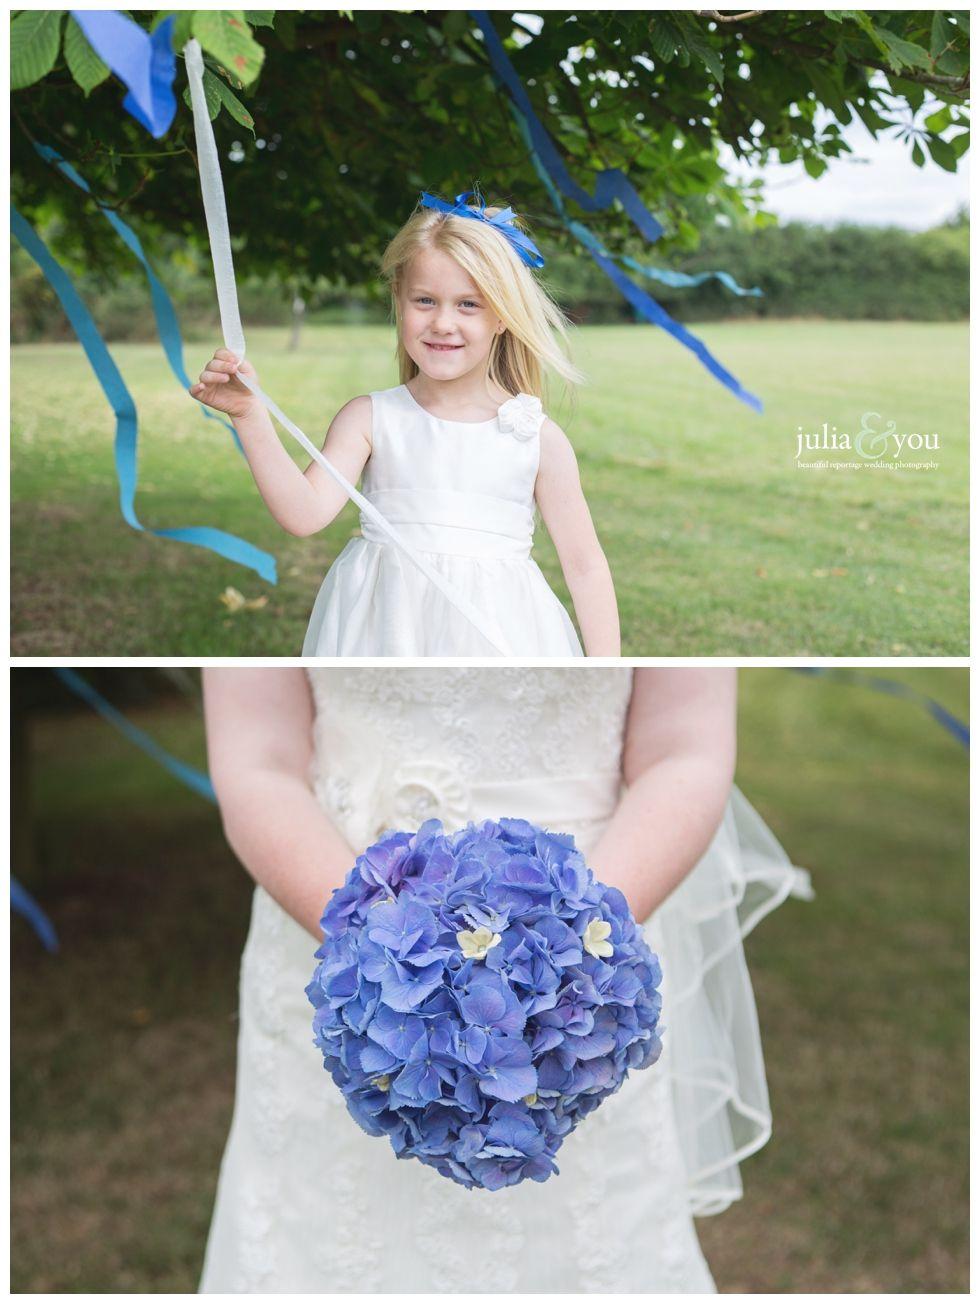 Juliaandyou u wedding photography year in review by